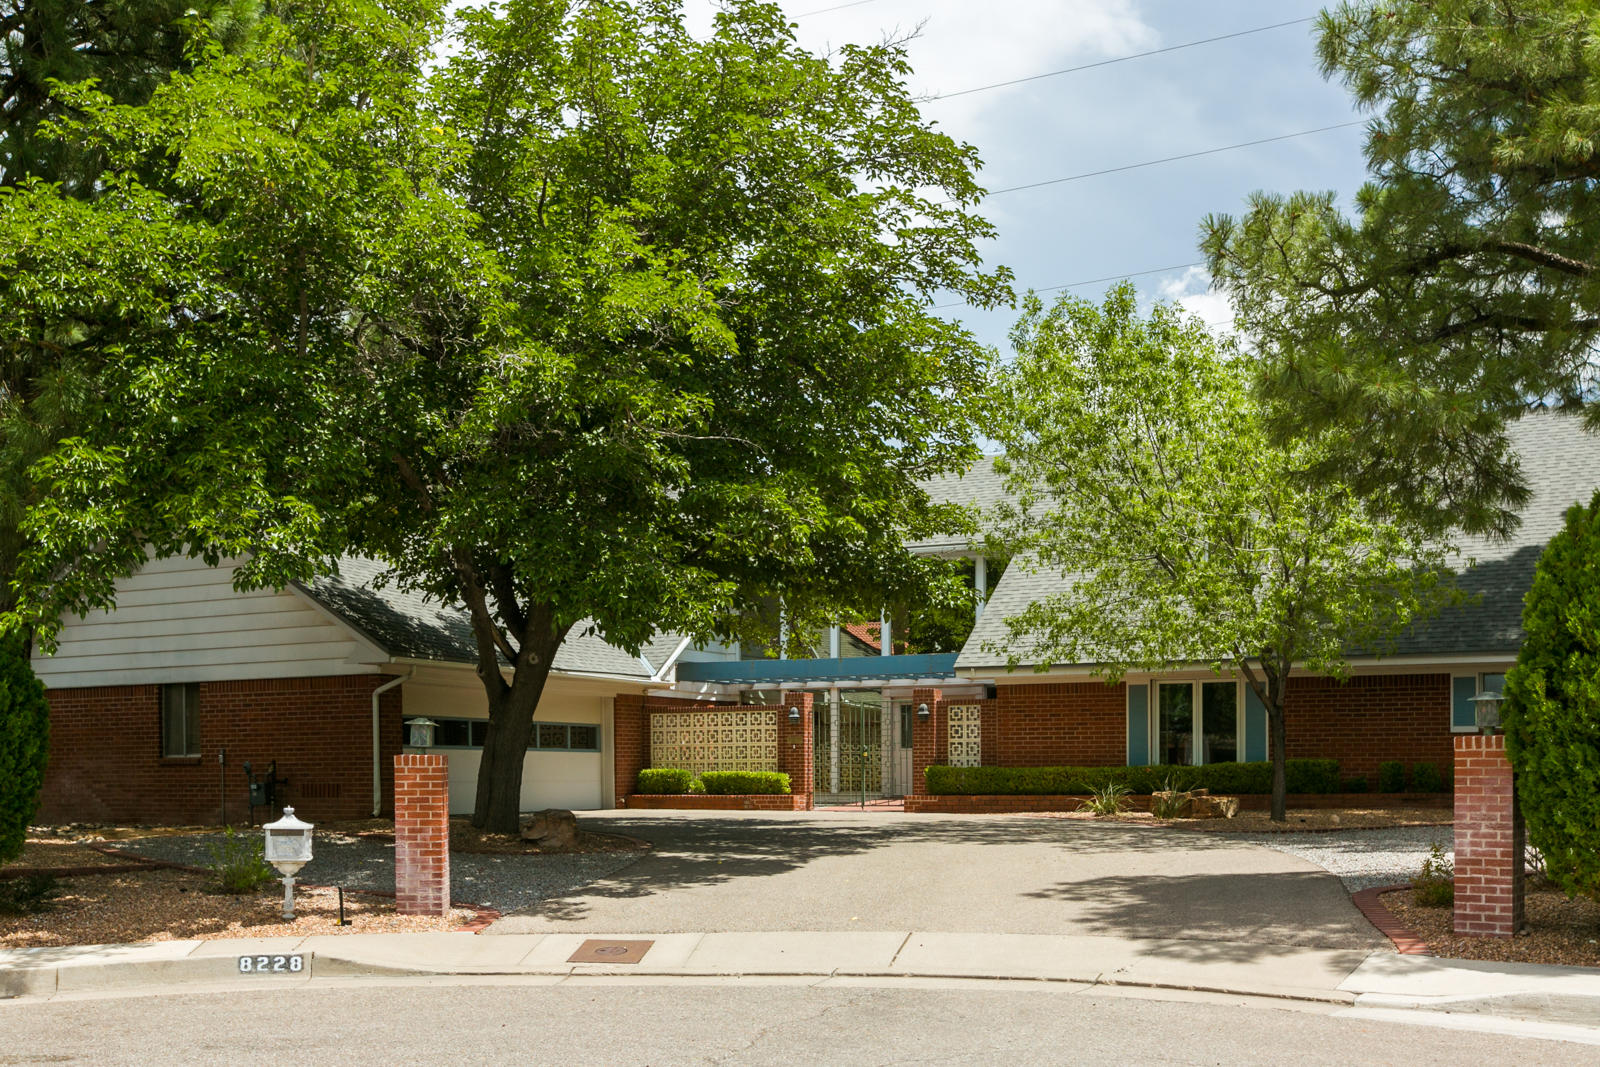 8228 PICKARD Court NE Property Photo - Albuquerque, NM real estate listing